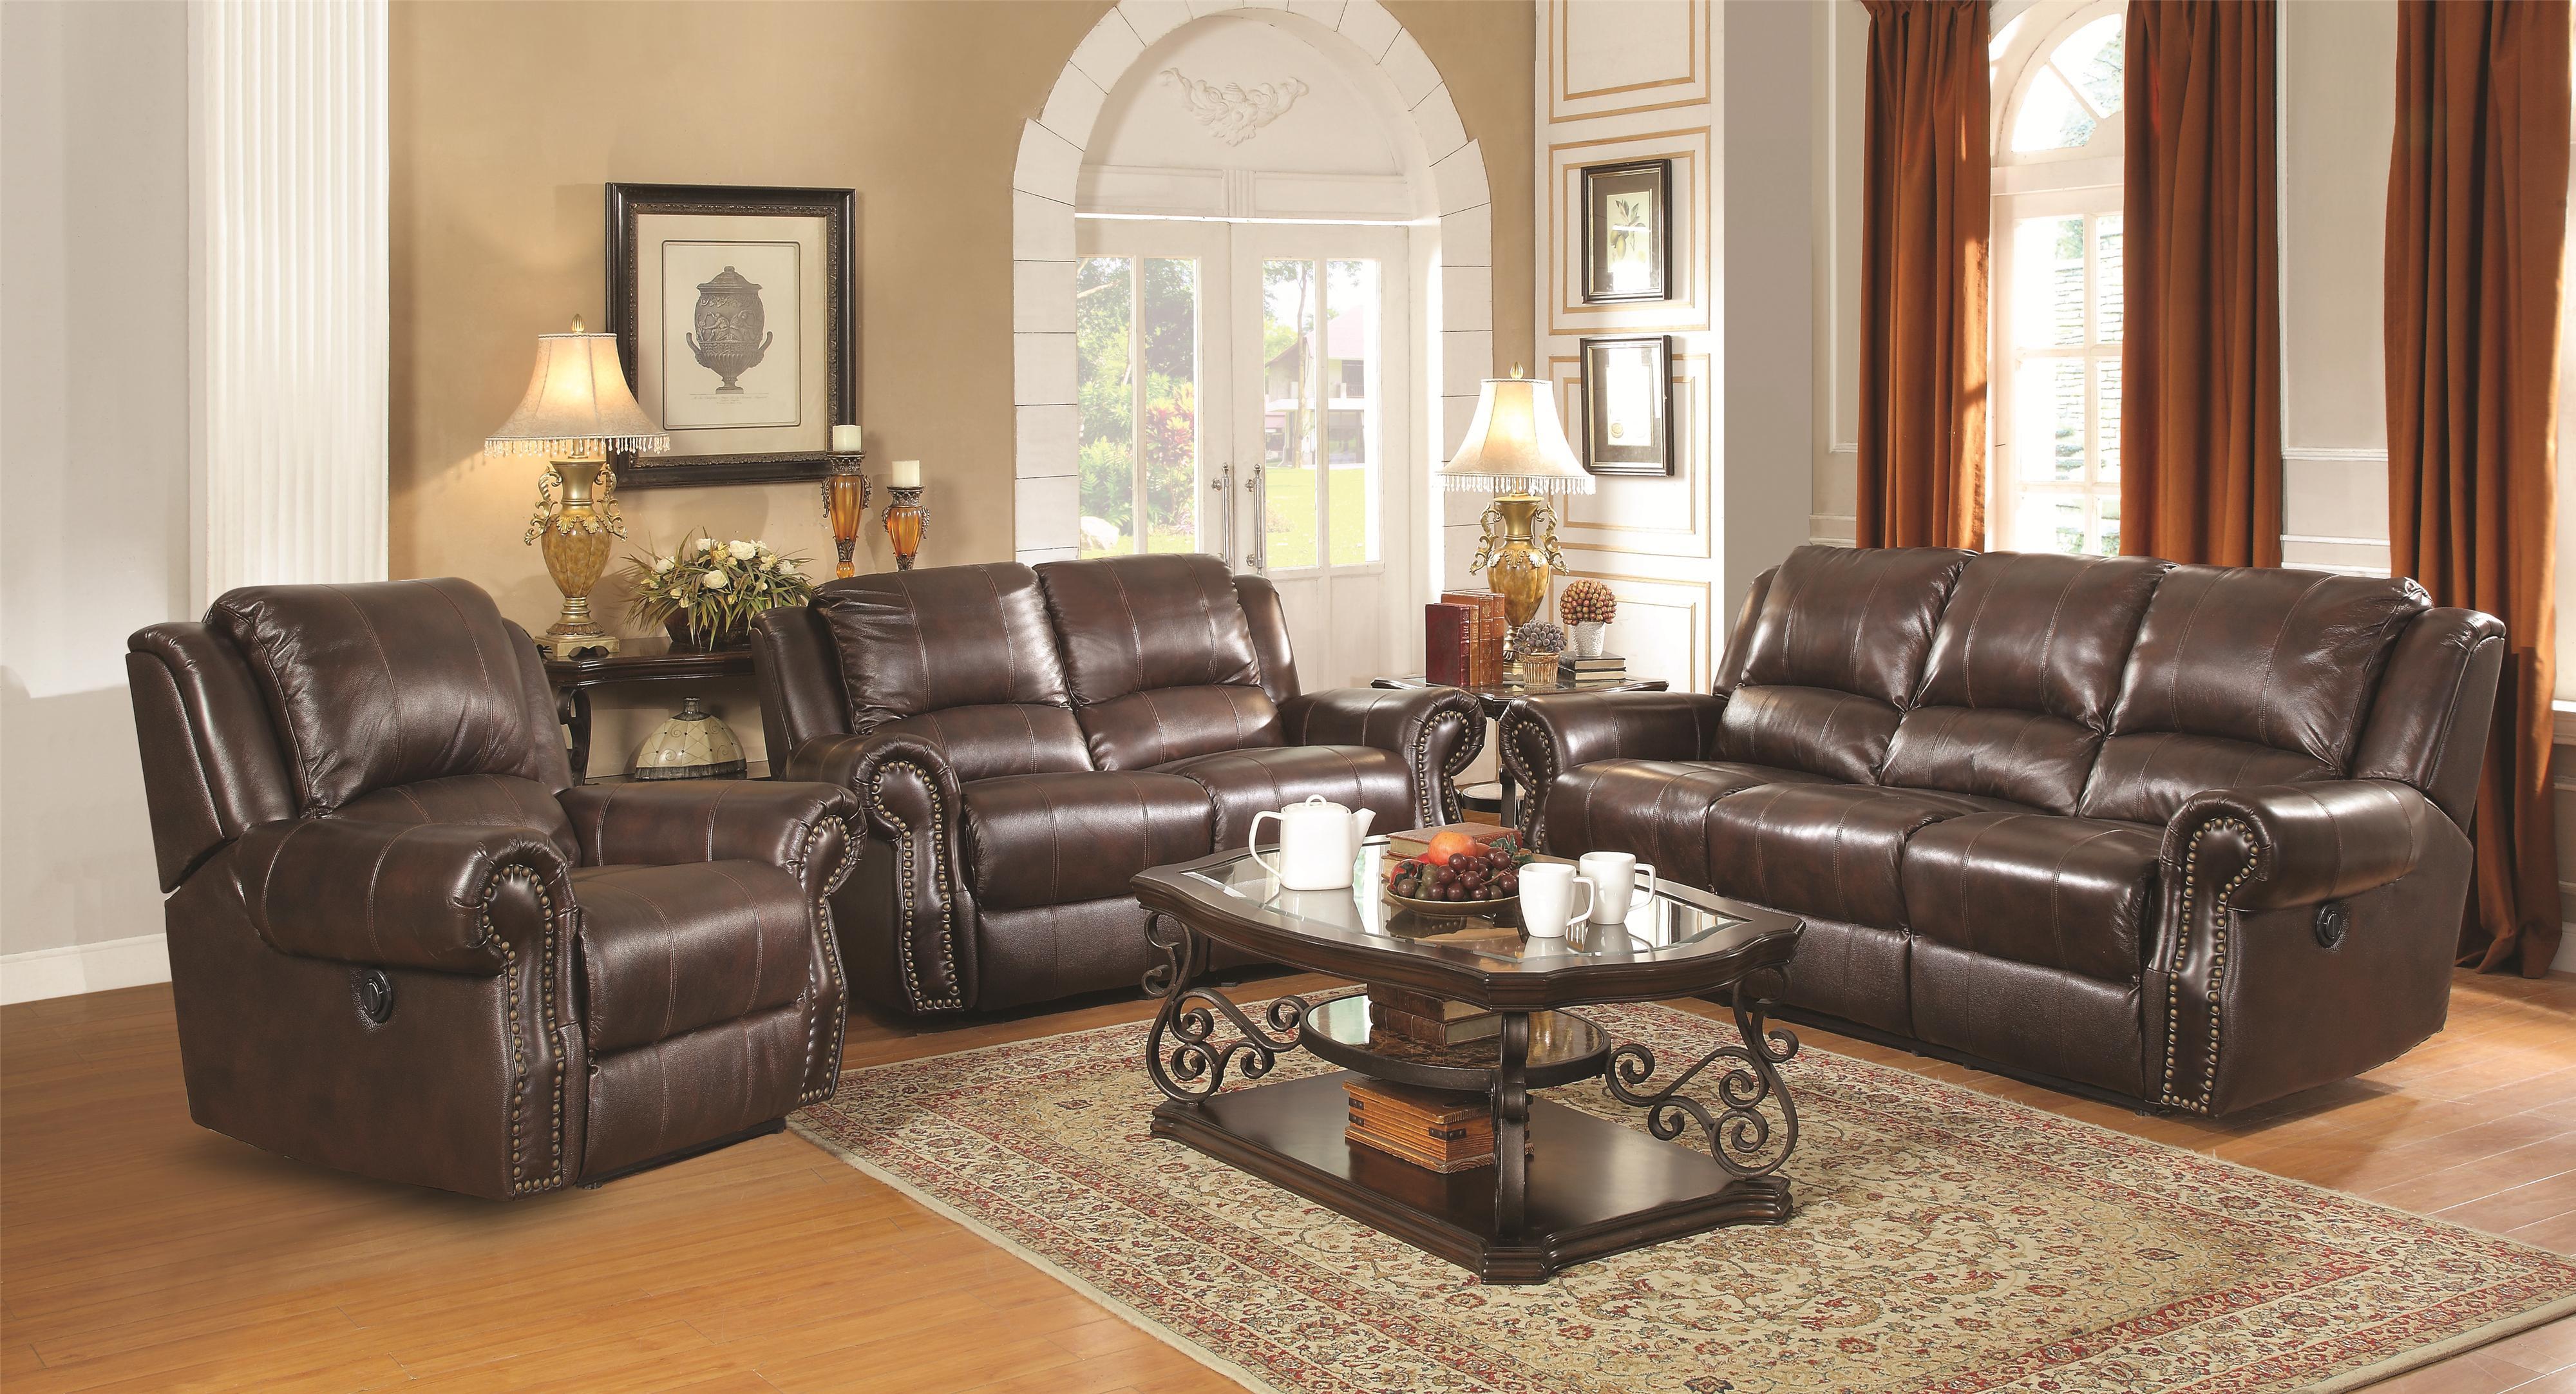 Coaster Sir Rawlinson Traditional Reclining Sofa With Nailhead Studs    Charleston Furniture   Reclining Sofa